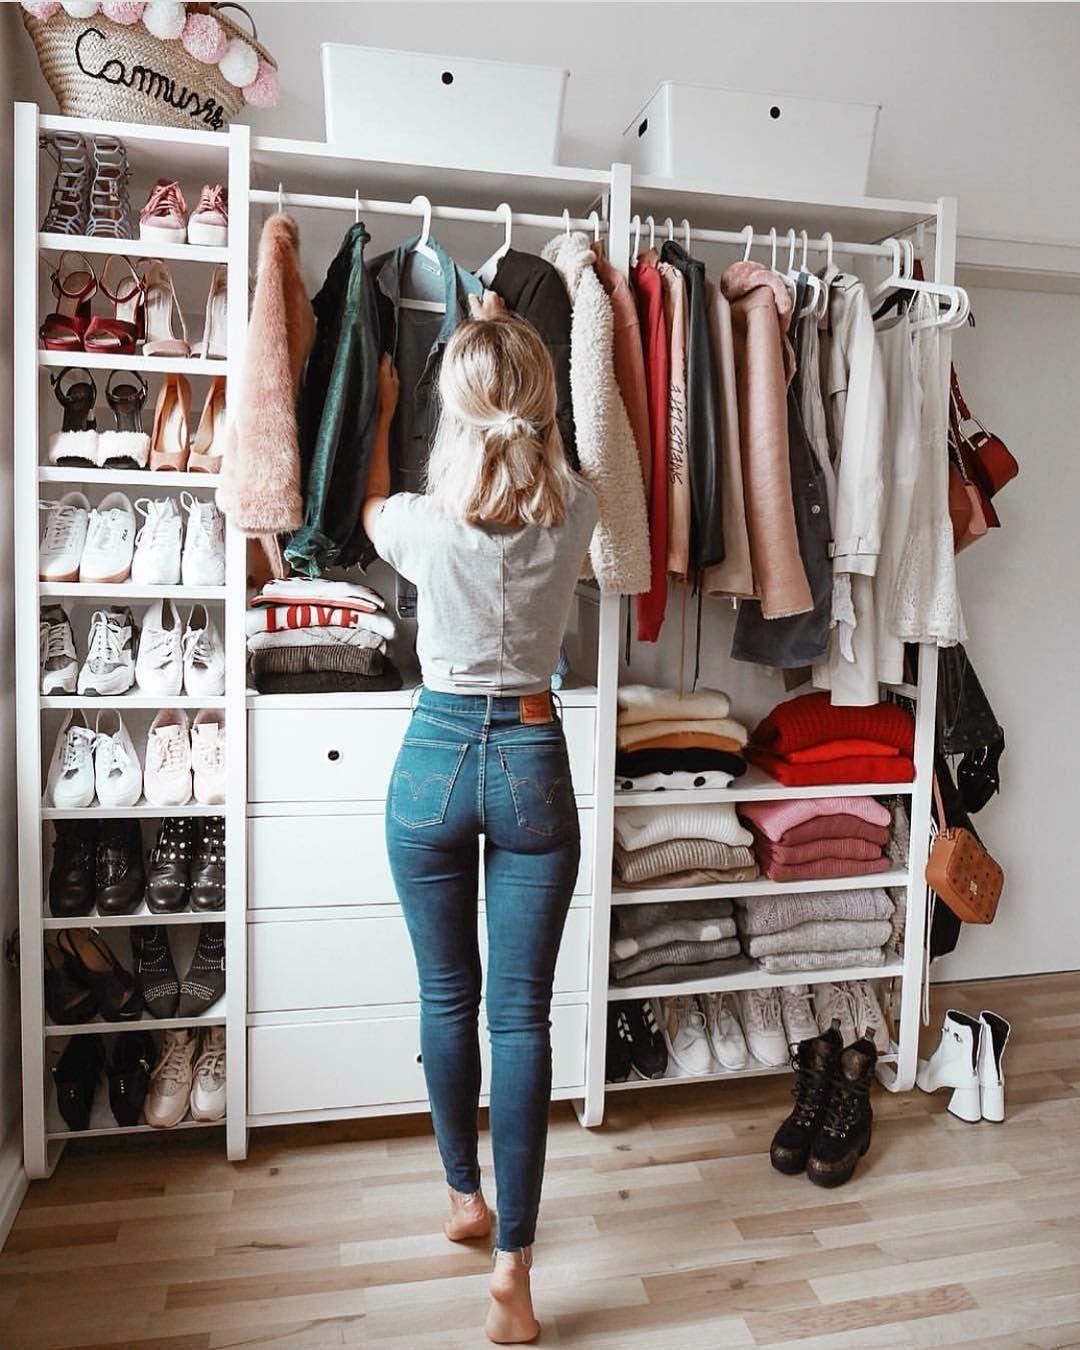 Pin By Julia On Inspo Best Closet Organization Closet Organisation Closet Bedroom